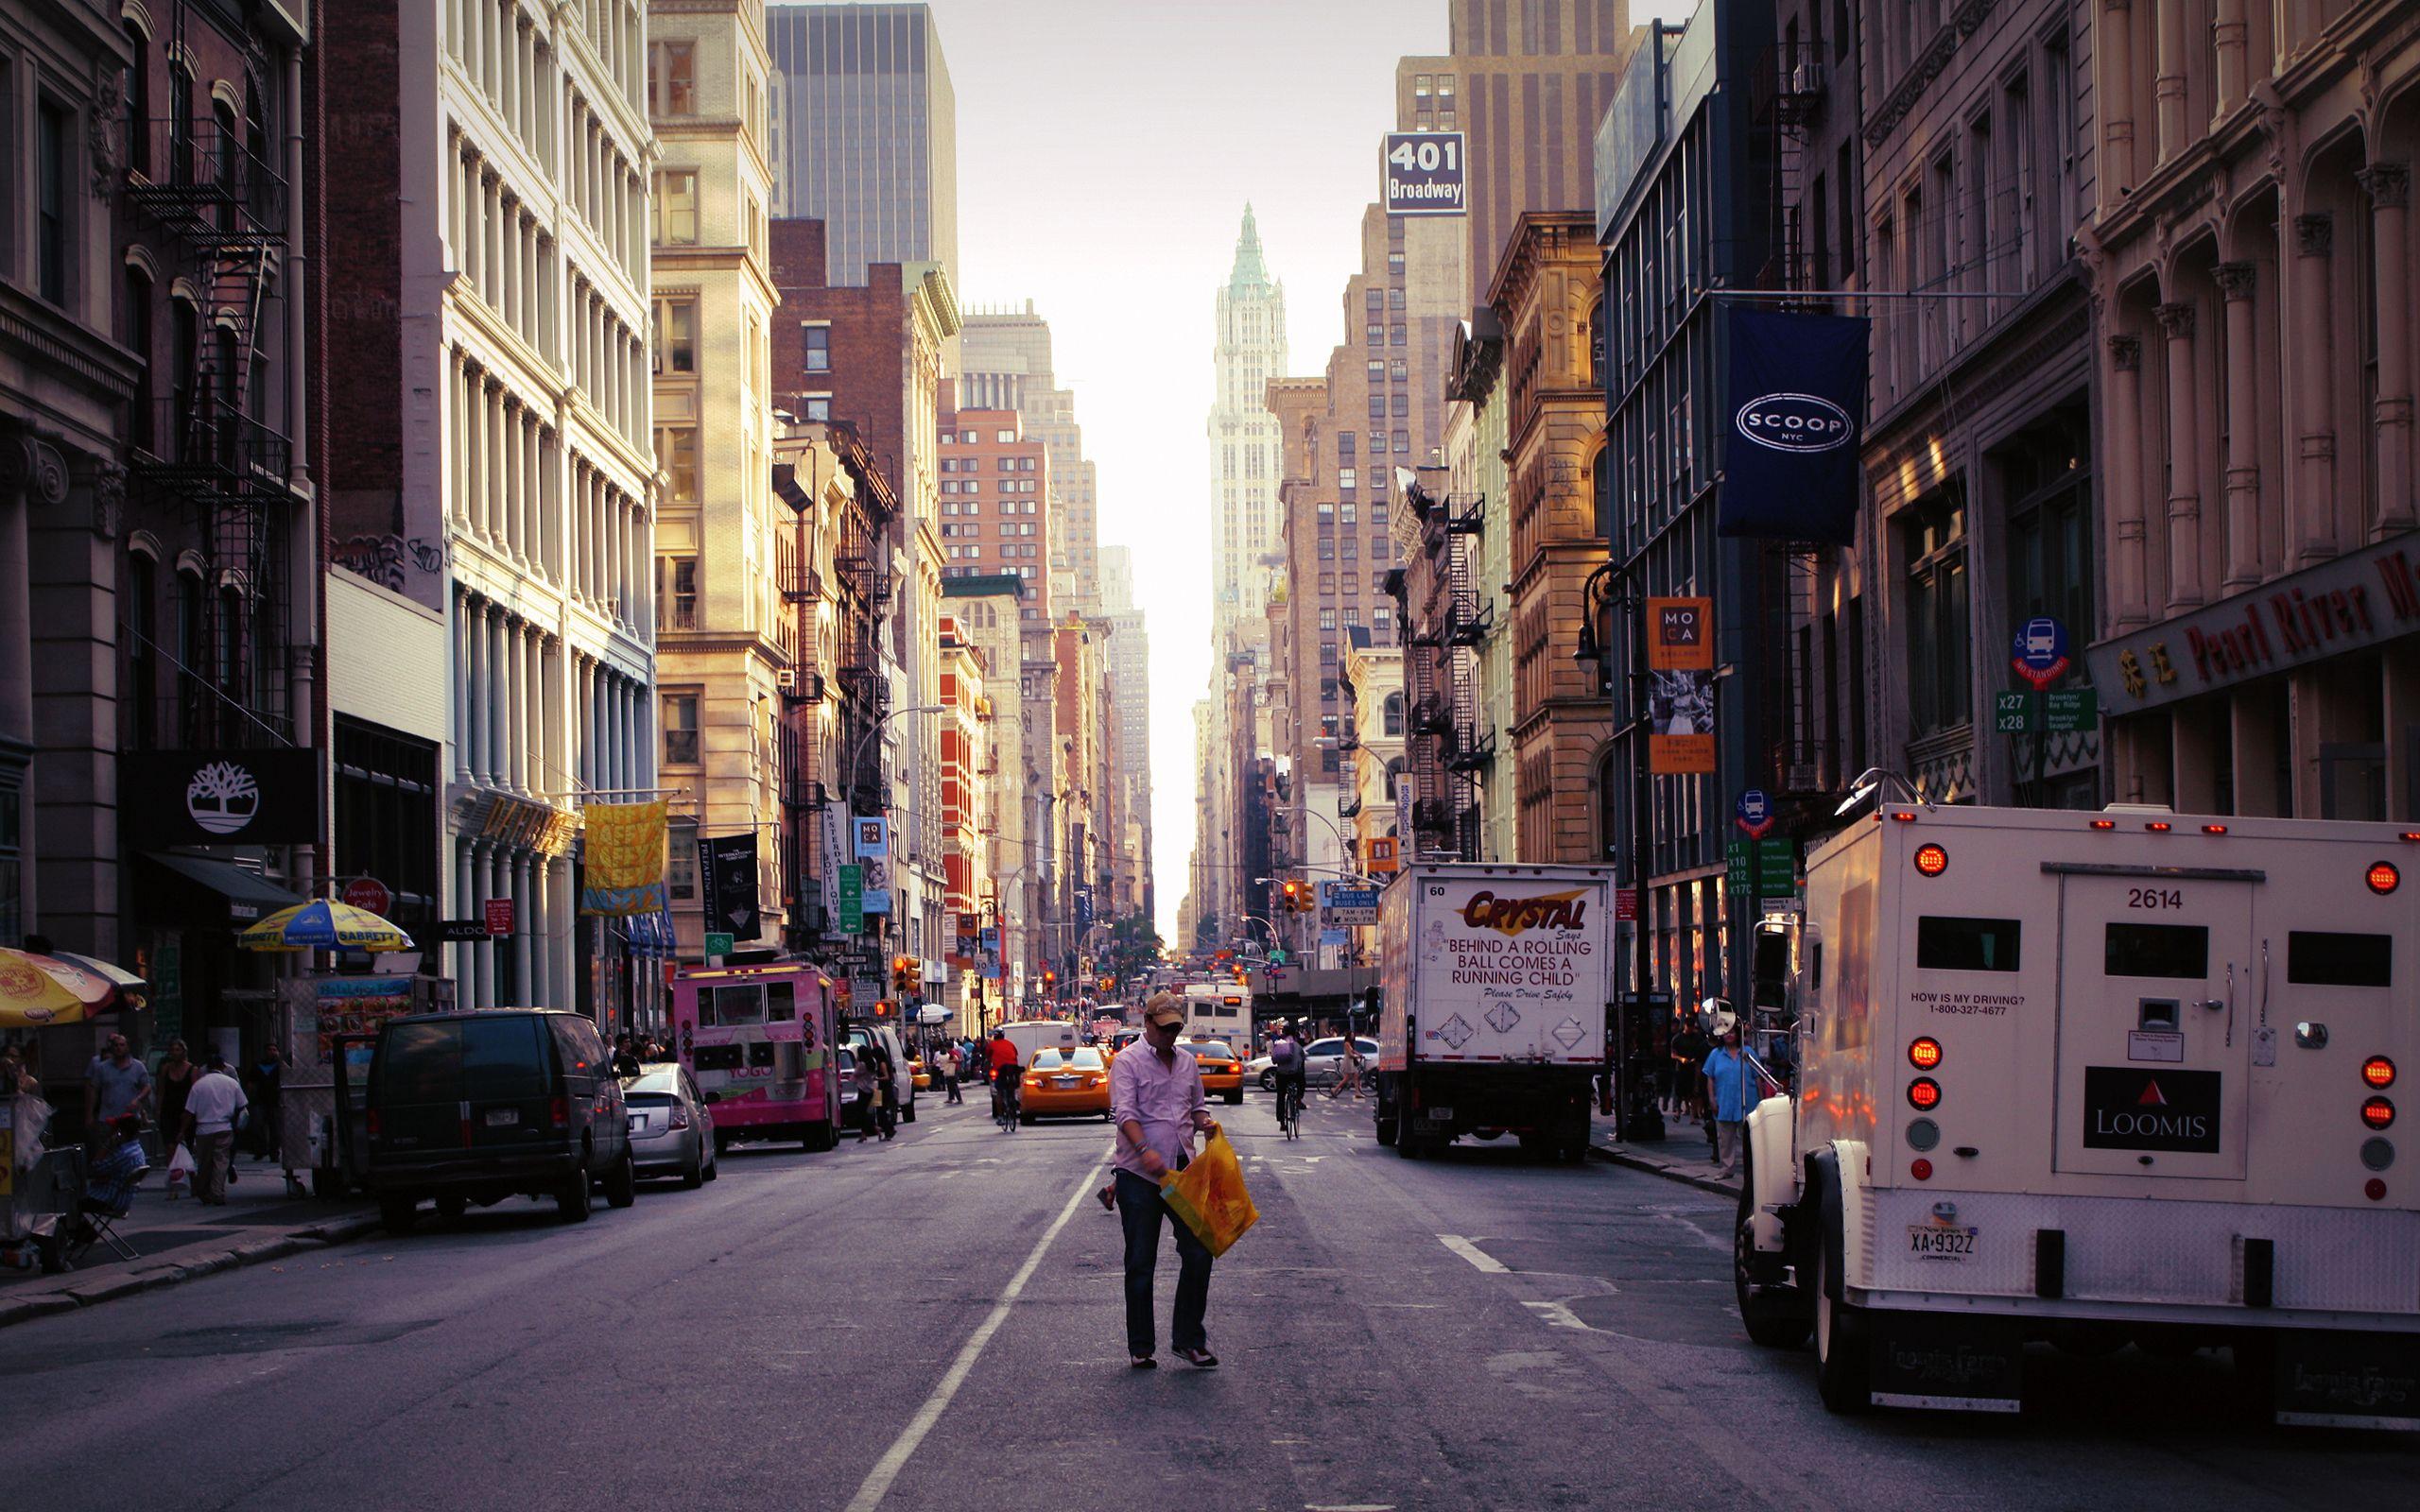 Hd Wallpaper City Street New York Wallpapers Xpx